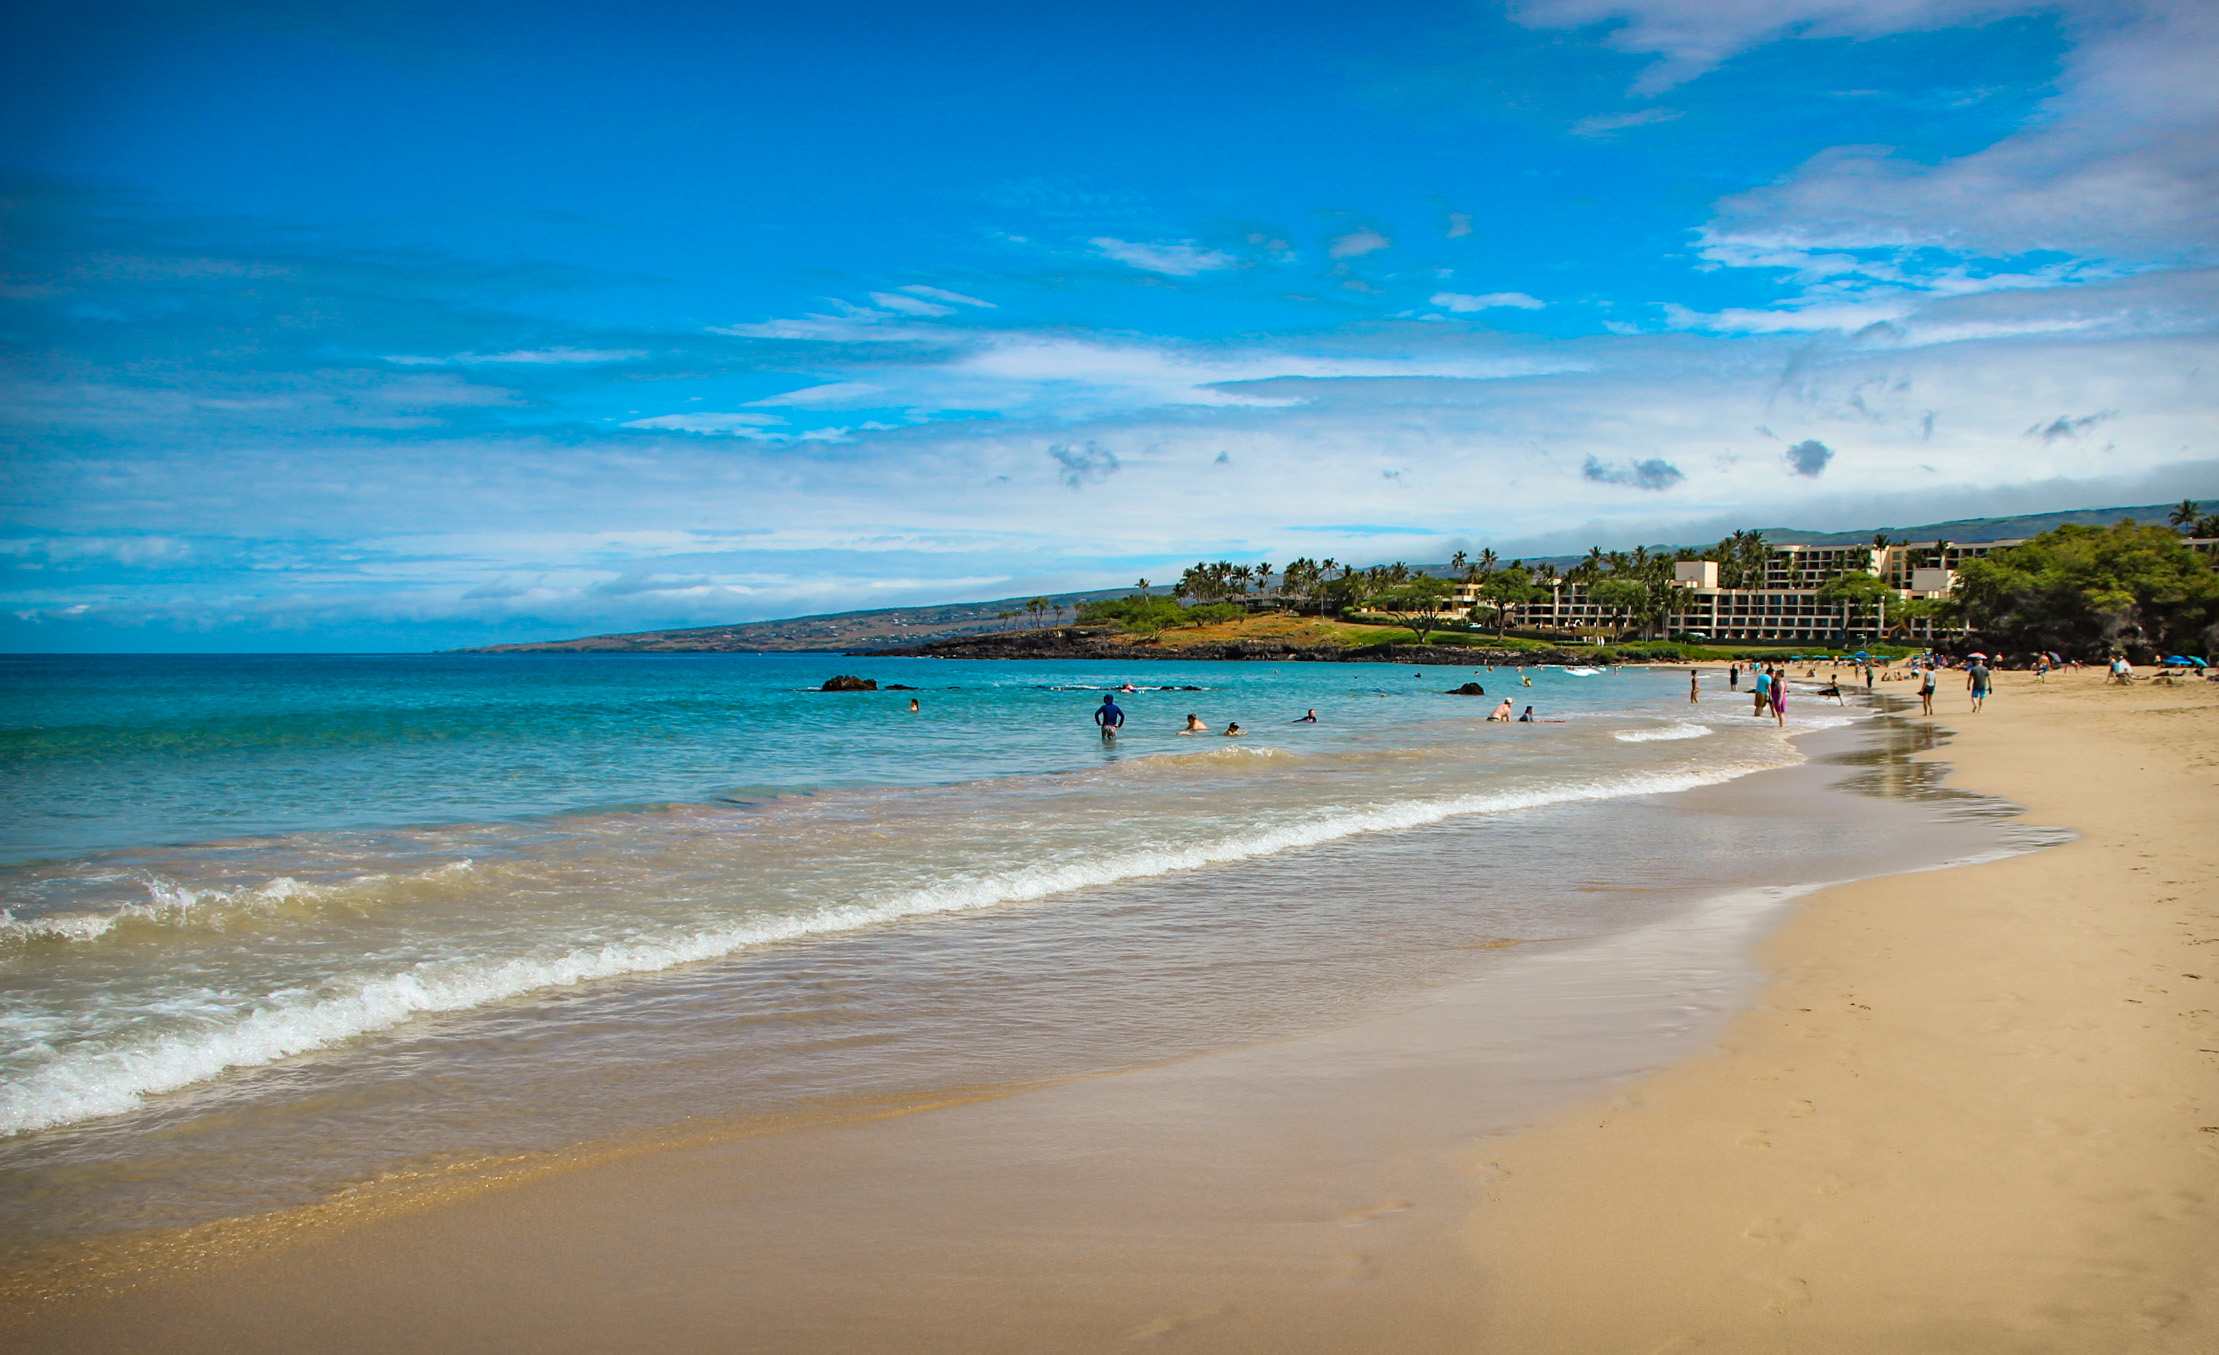 BIG ISLAND, Hapuna Beach State